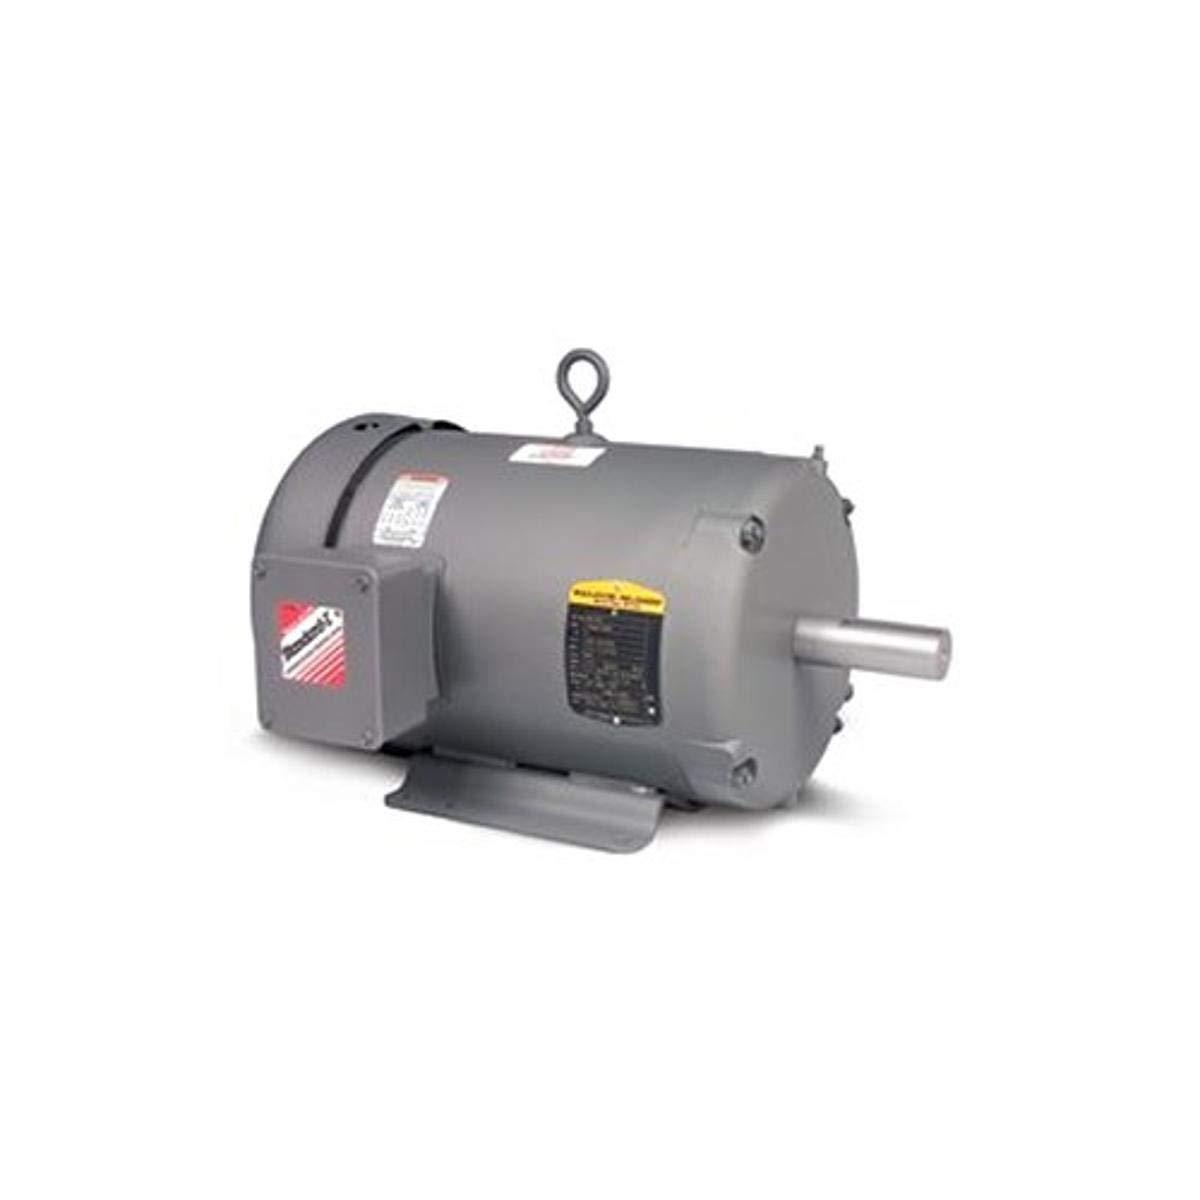 BALDOR M3538 56 Frames TEFC 3416M 3 Phase Enclosed Motors, F1, 3PH, 0.5 hp, 1725 RPM, 60 Hz